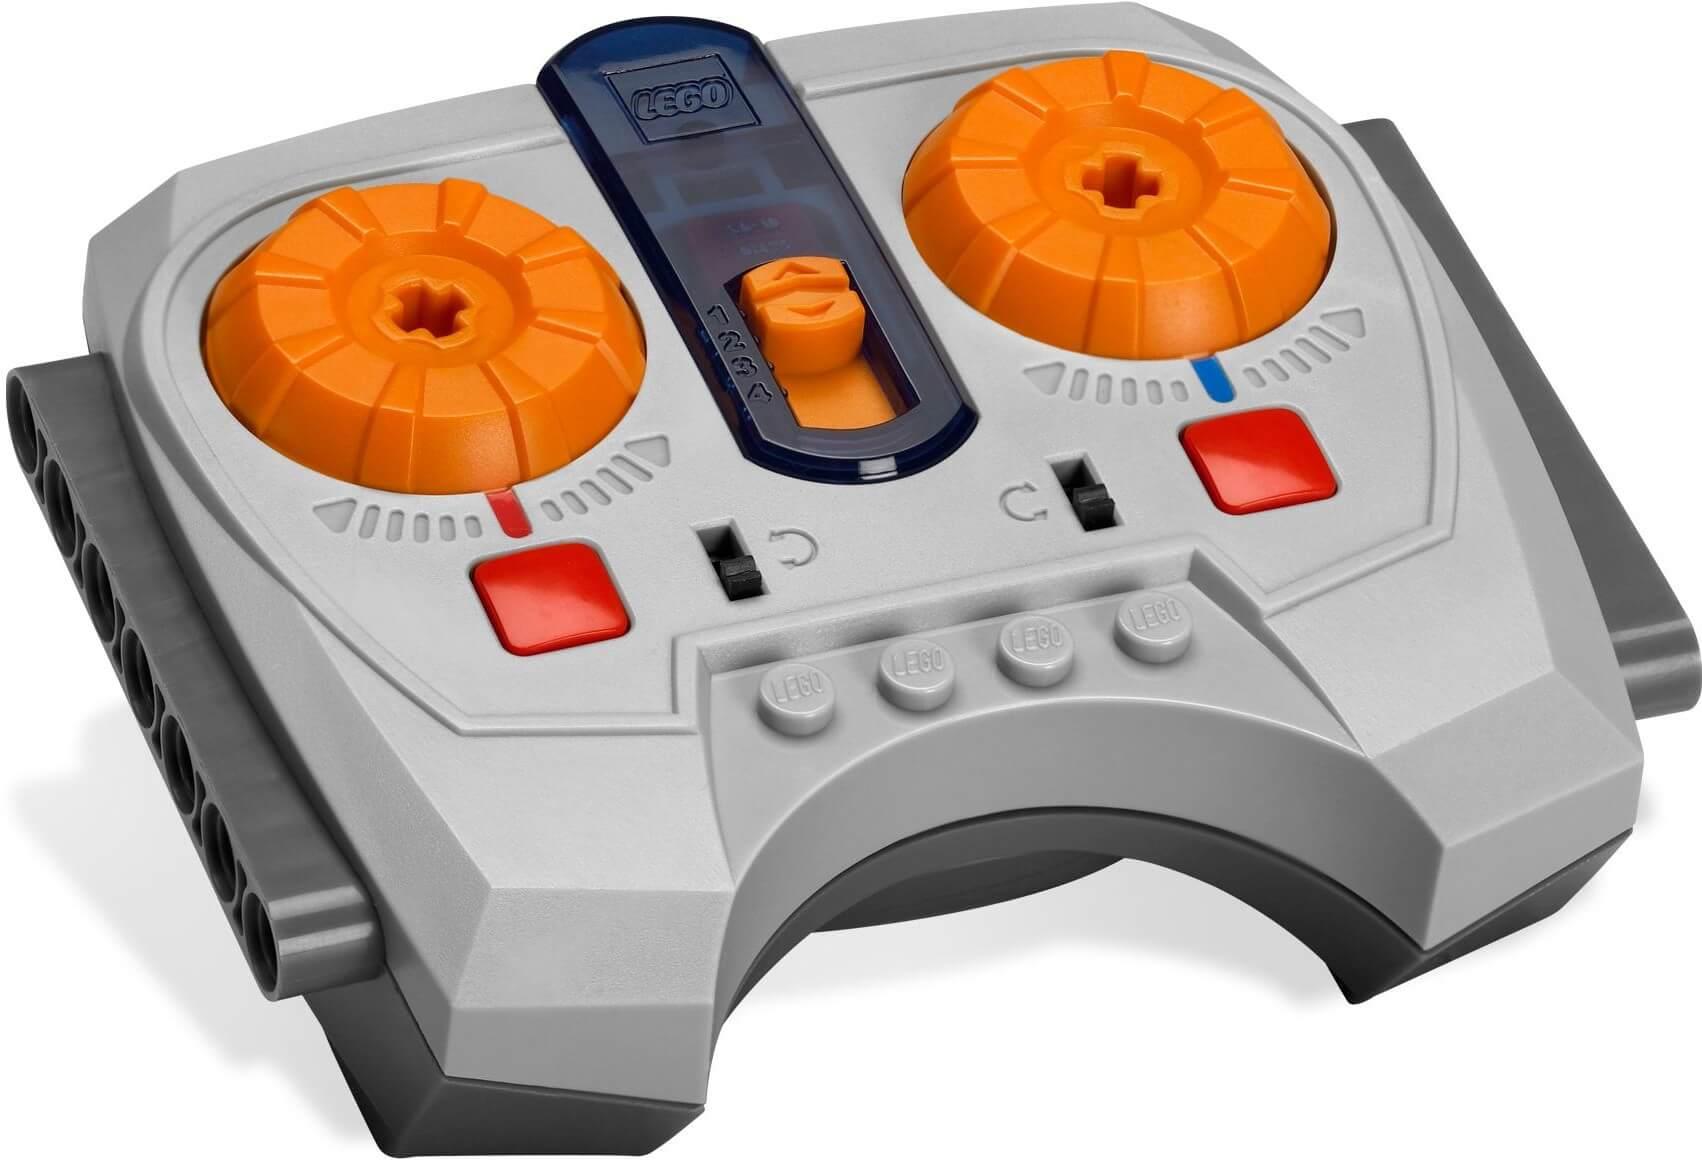 Mua đồ chơi LEGO 8879 - LEGO Power Functions 8879 - Remote điều khiển tốc độ từ xa (LEGO Power Functions IR Speed Remote Control 8879)